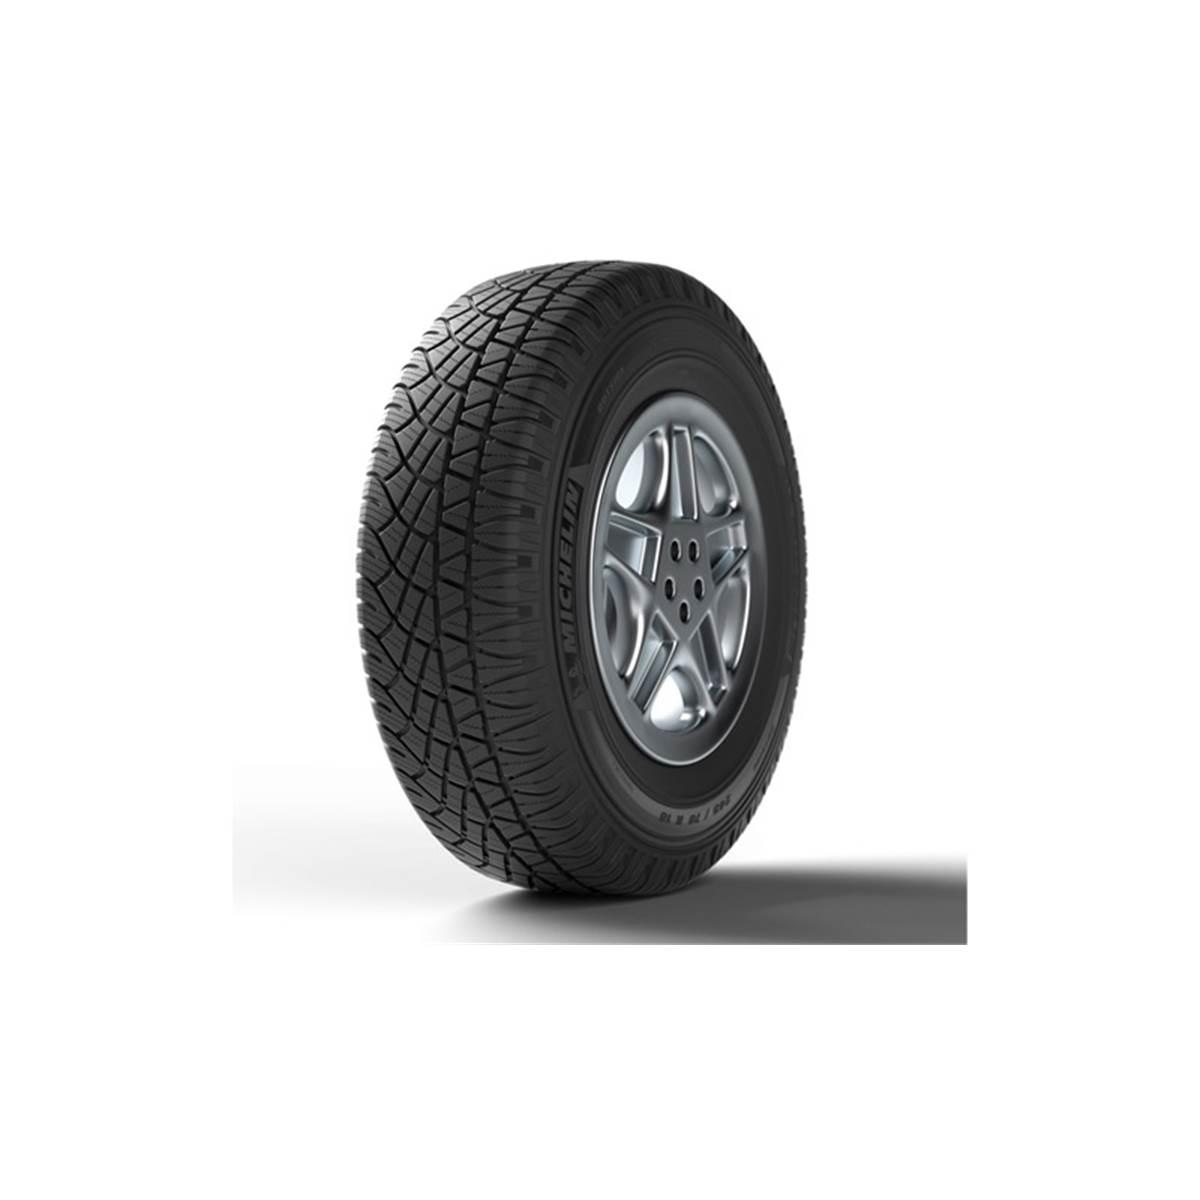 Michelin Latitude Cross XL pneu